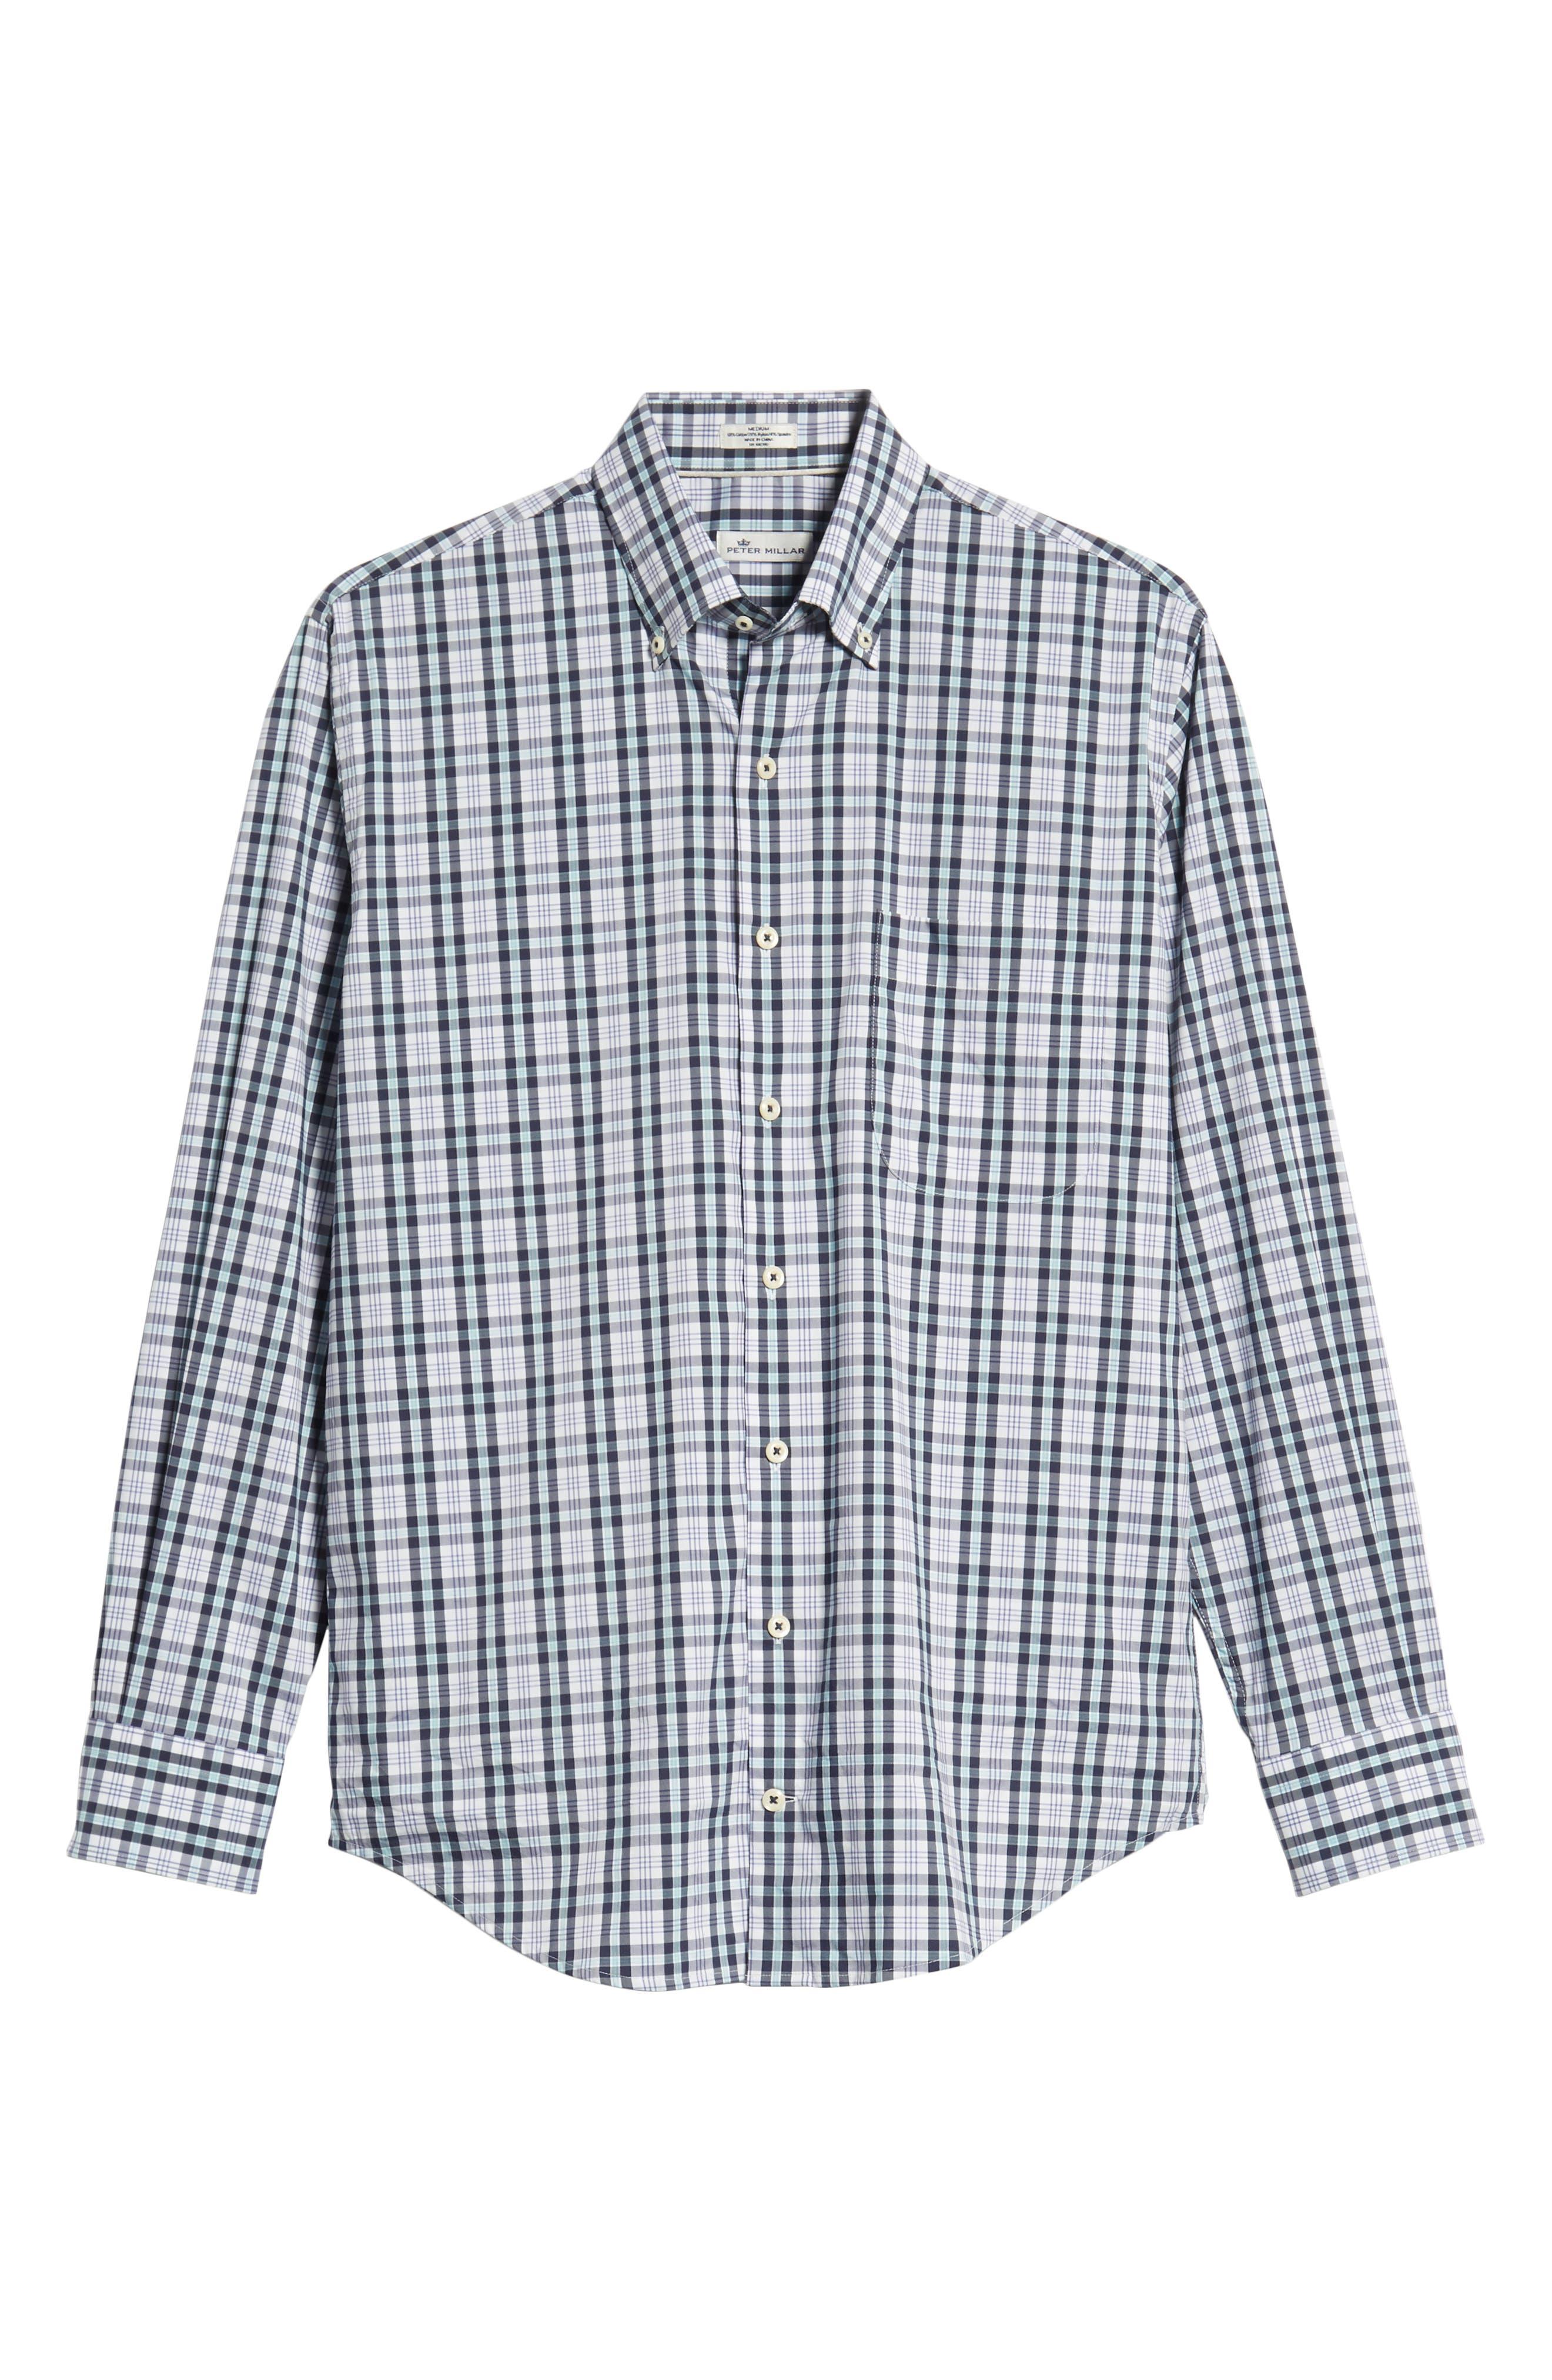 Moritz Check Sport Shirt,                             Alternate thumbnail 5, color,                             NAVY